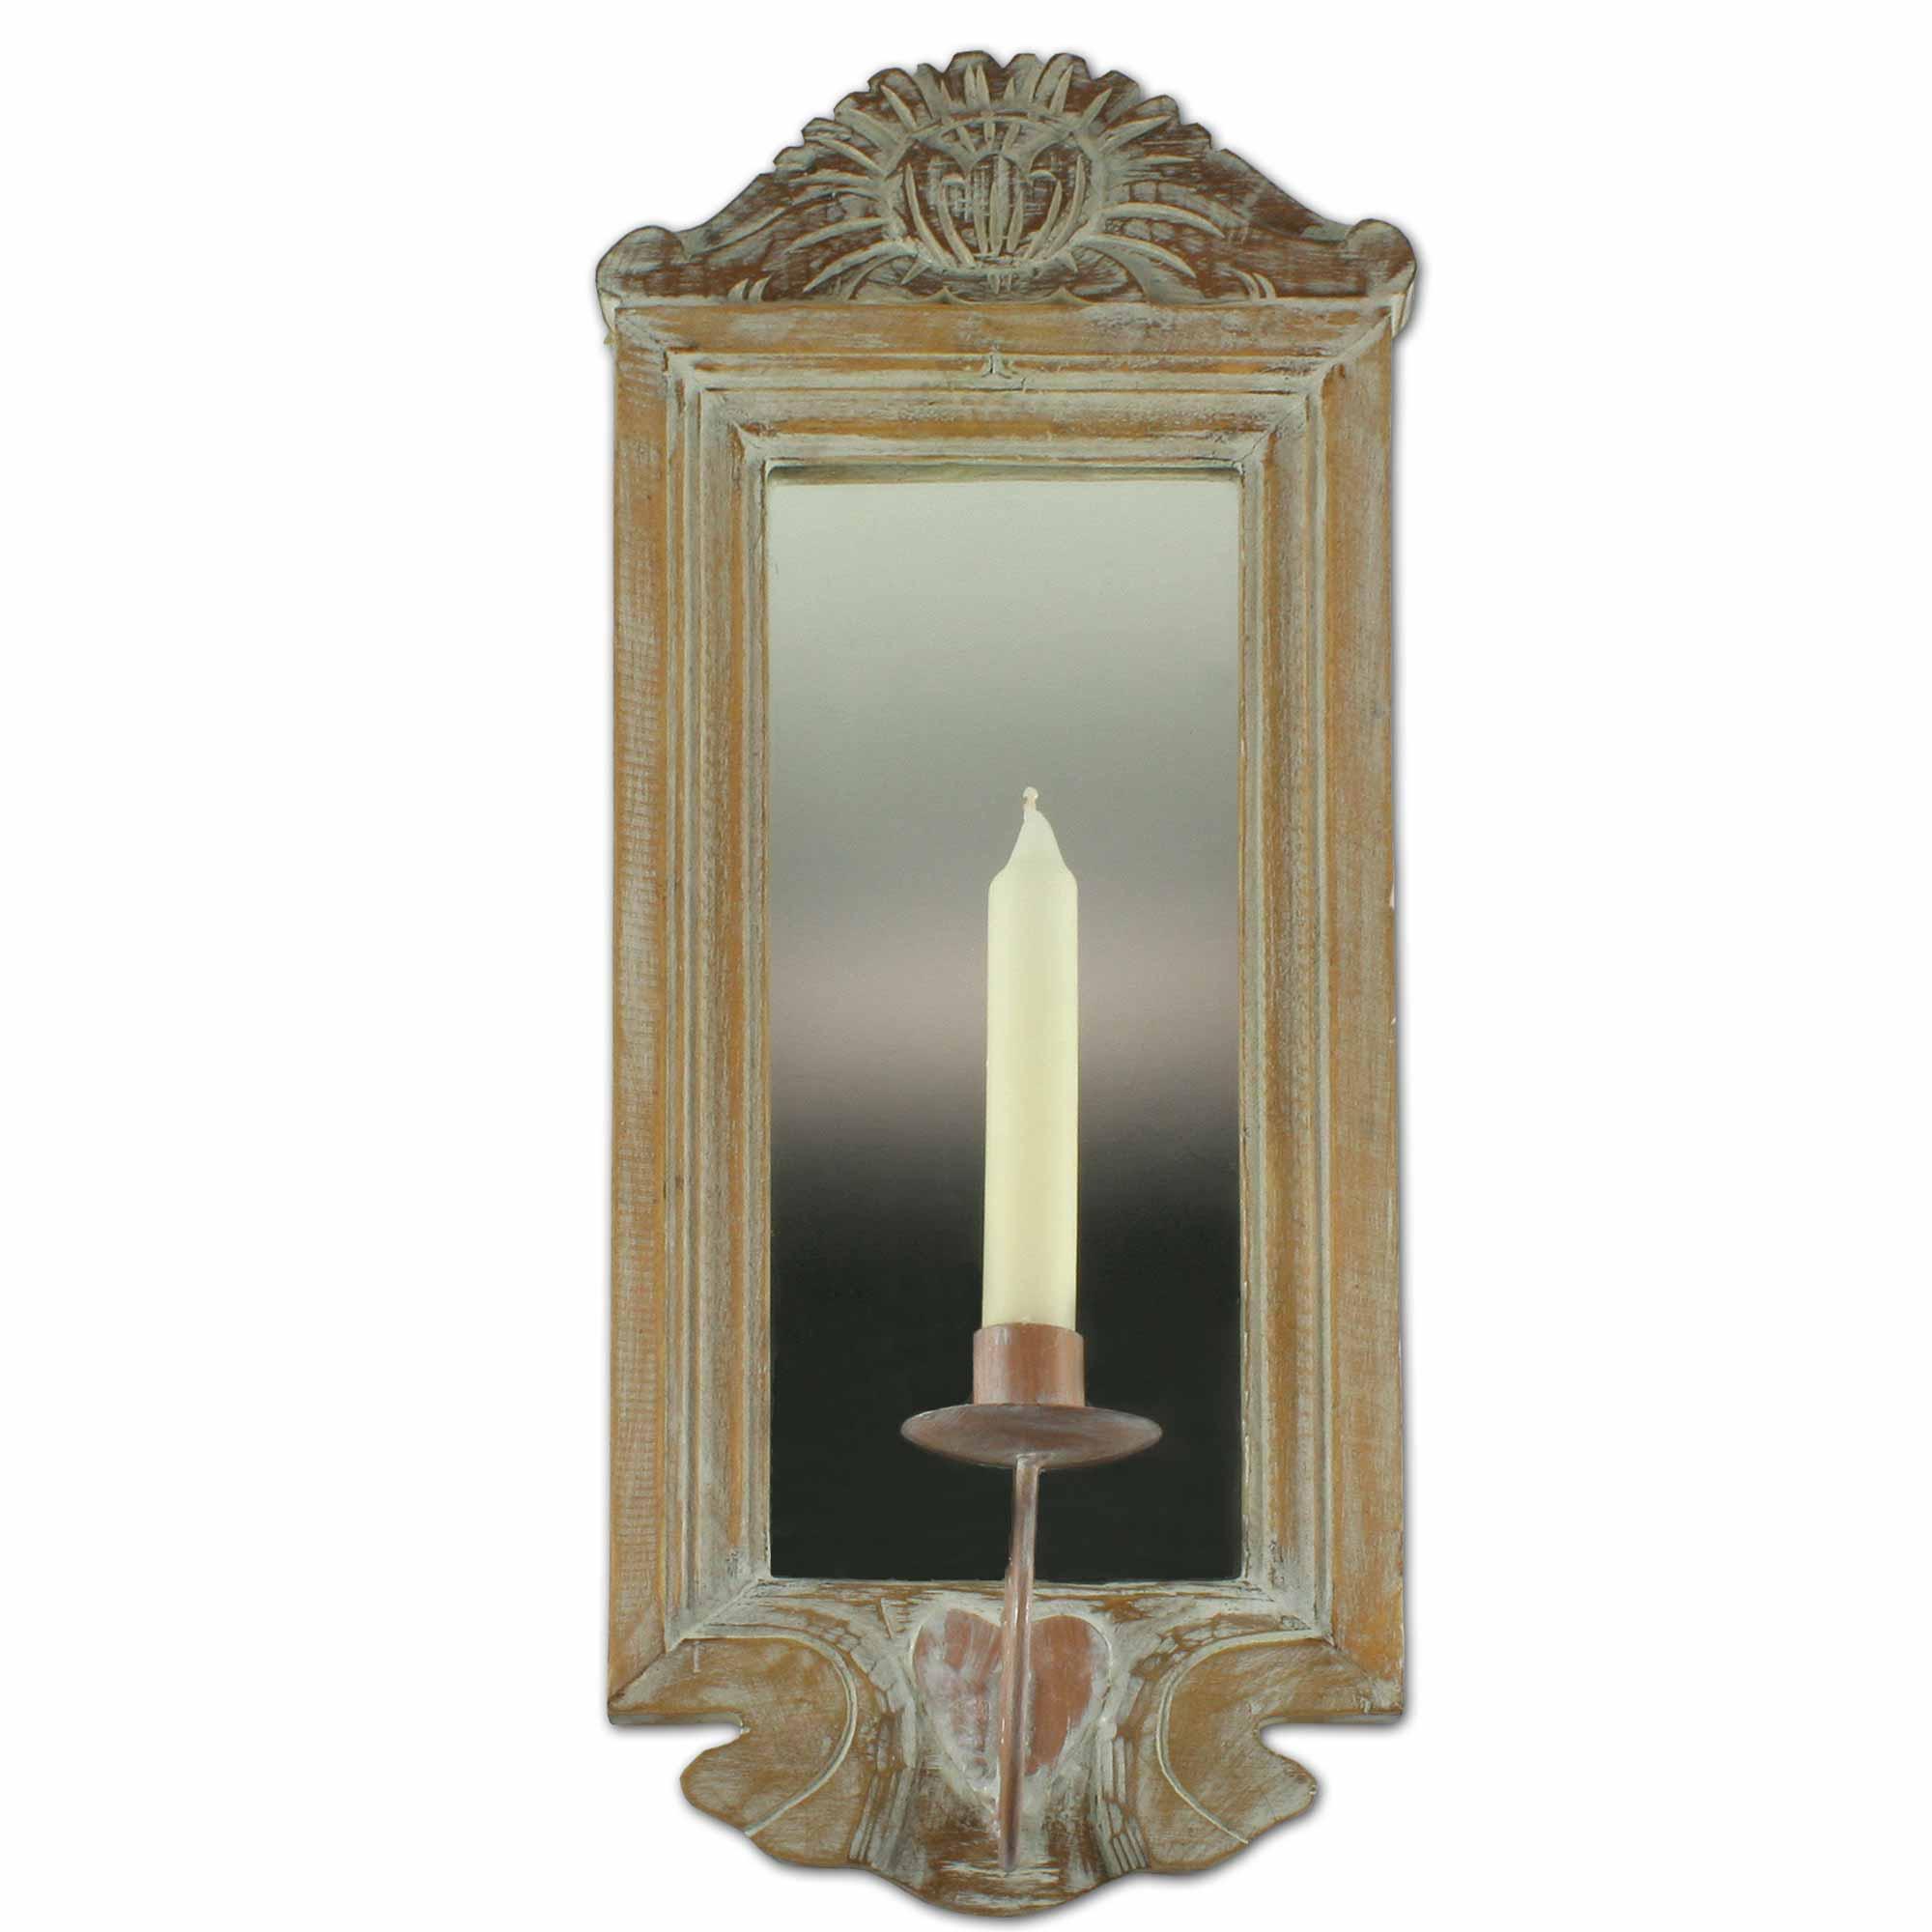 wandspiegel mit kerzenhalter echtholzrahmen 54x20 cm. Black Bedroom Furniture Sets. Home Design Ideas